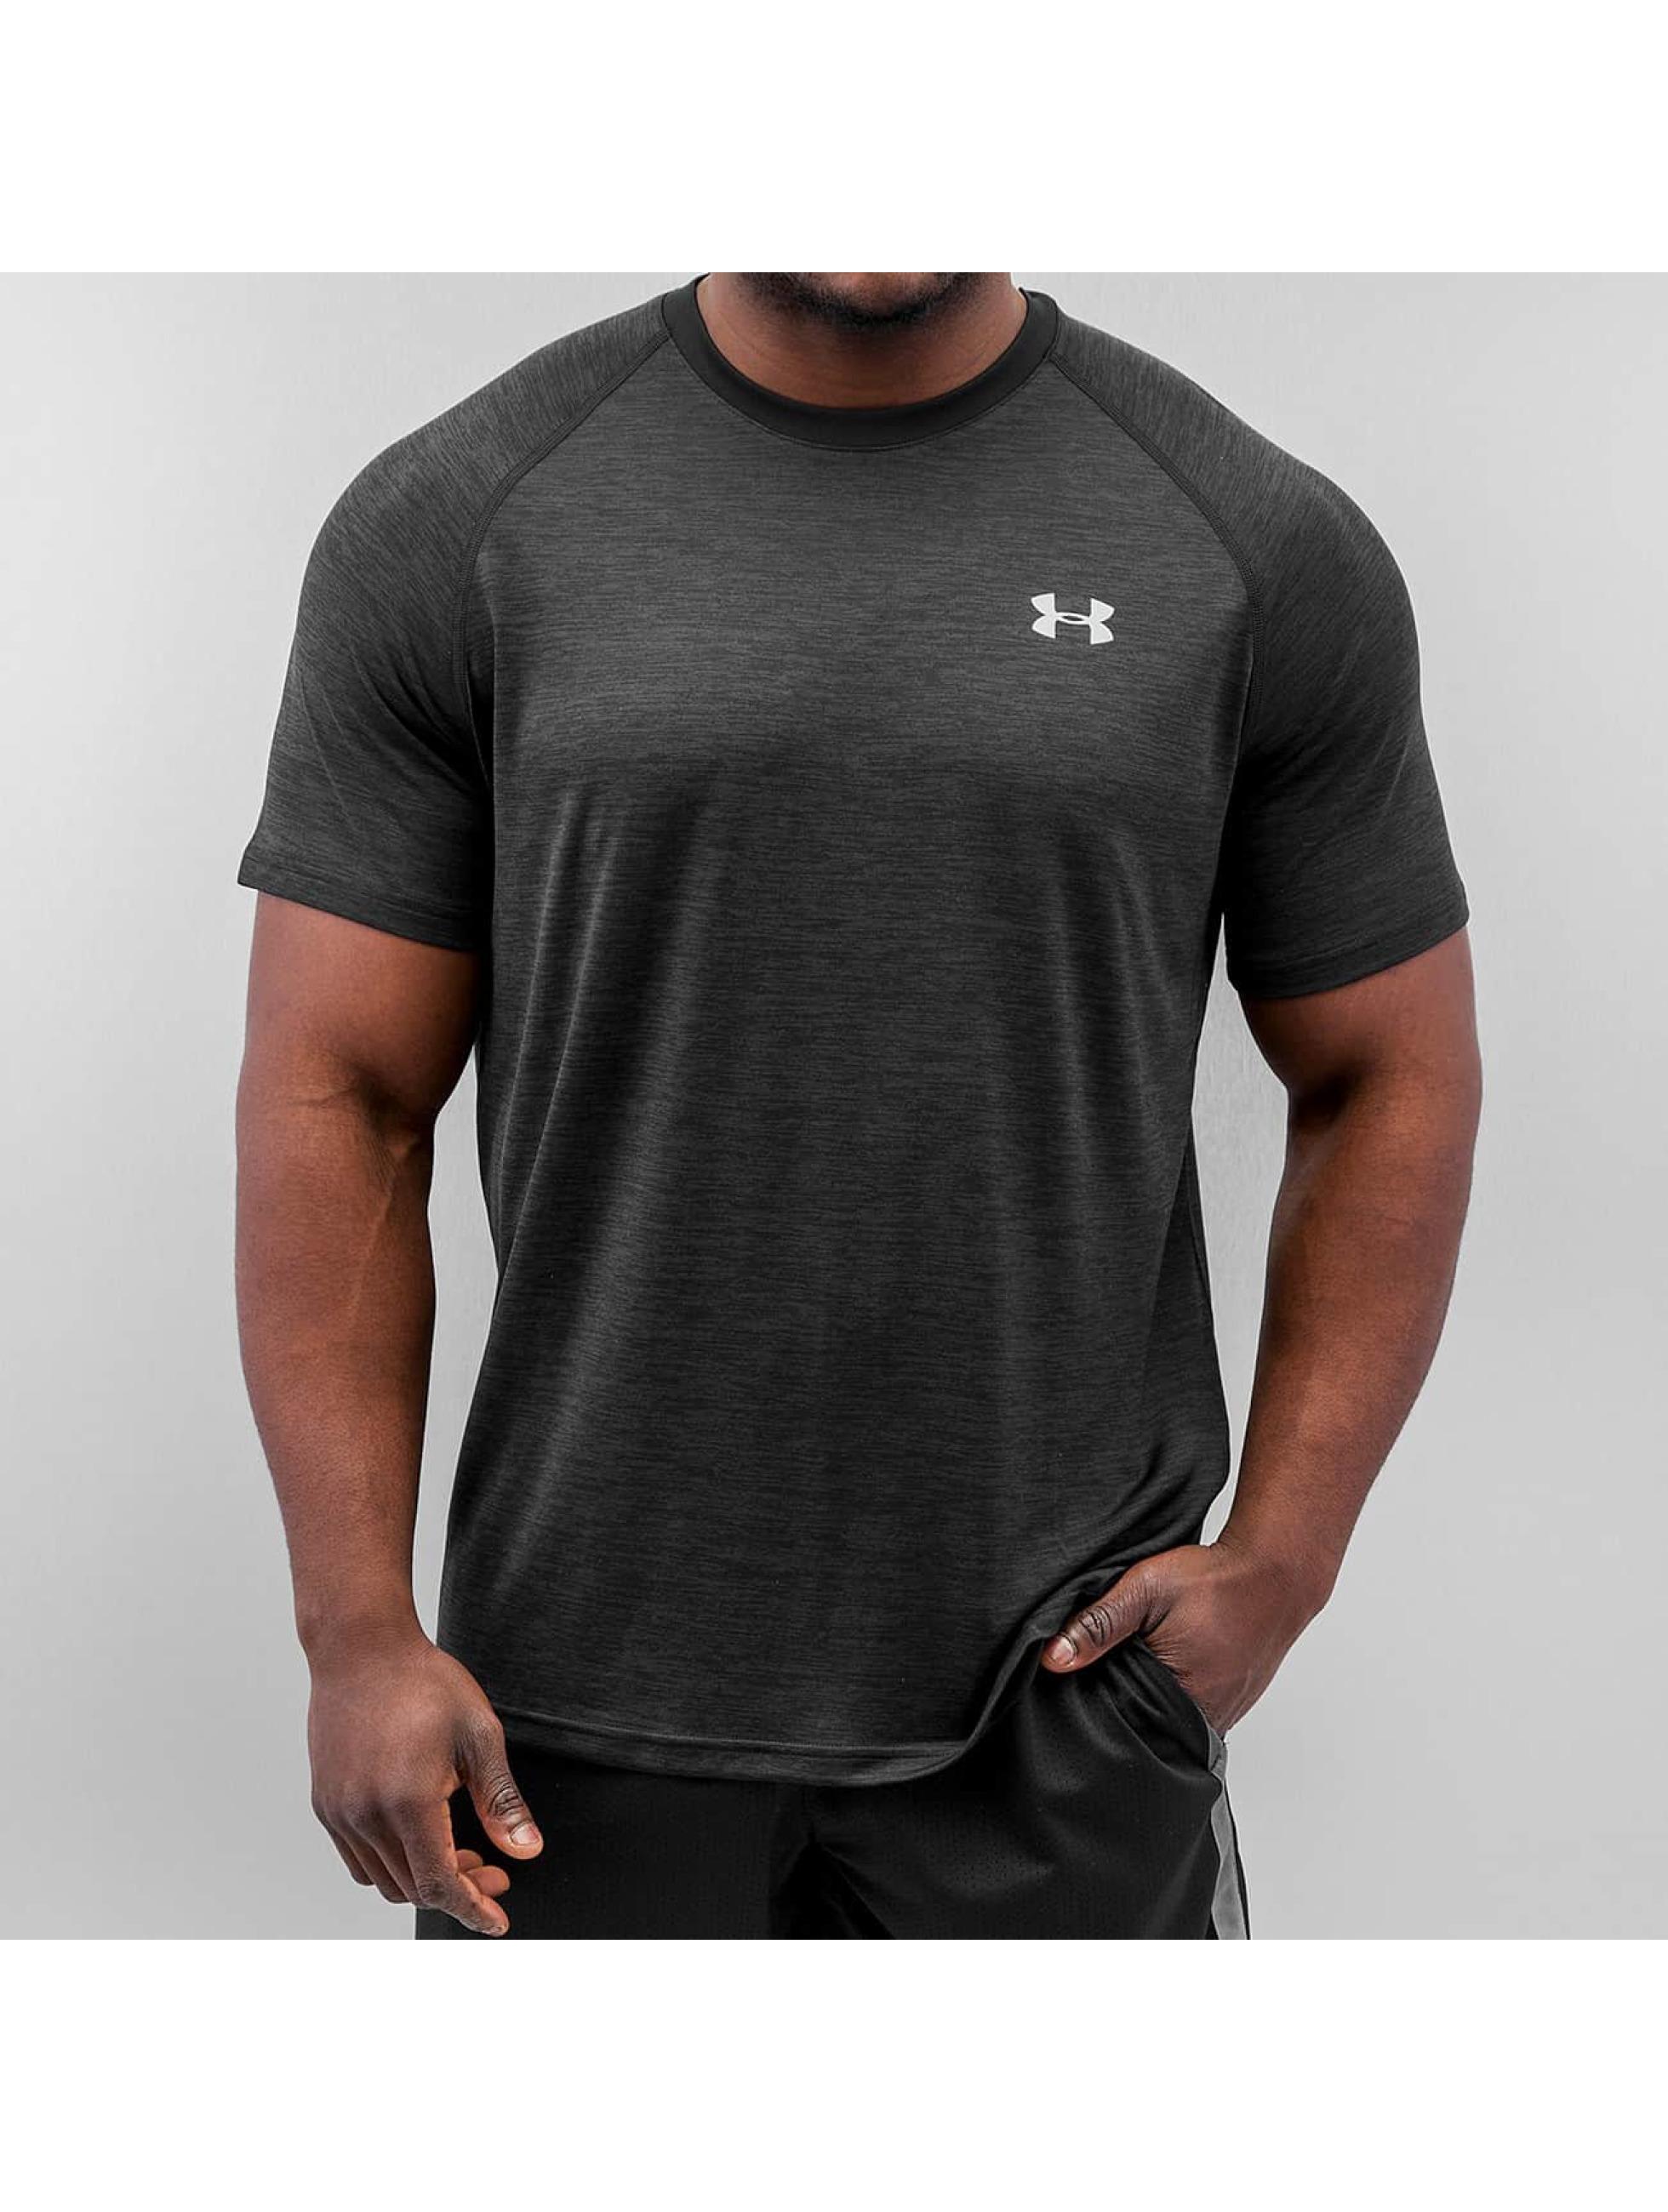 Under armour herren t shirt tech in schwarz 210262 for Original under armour shirt